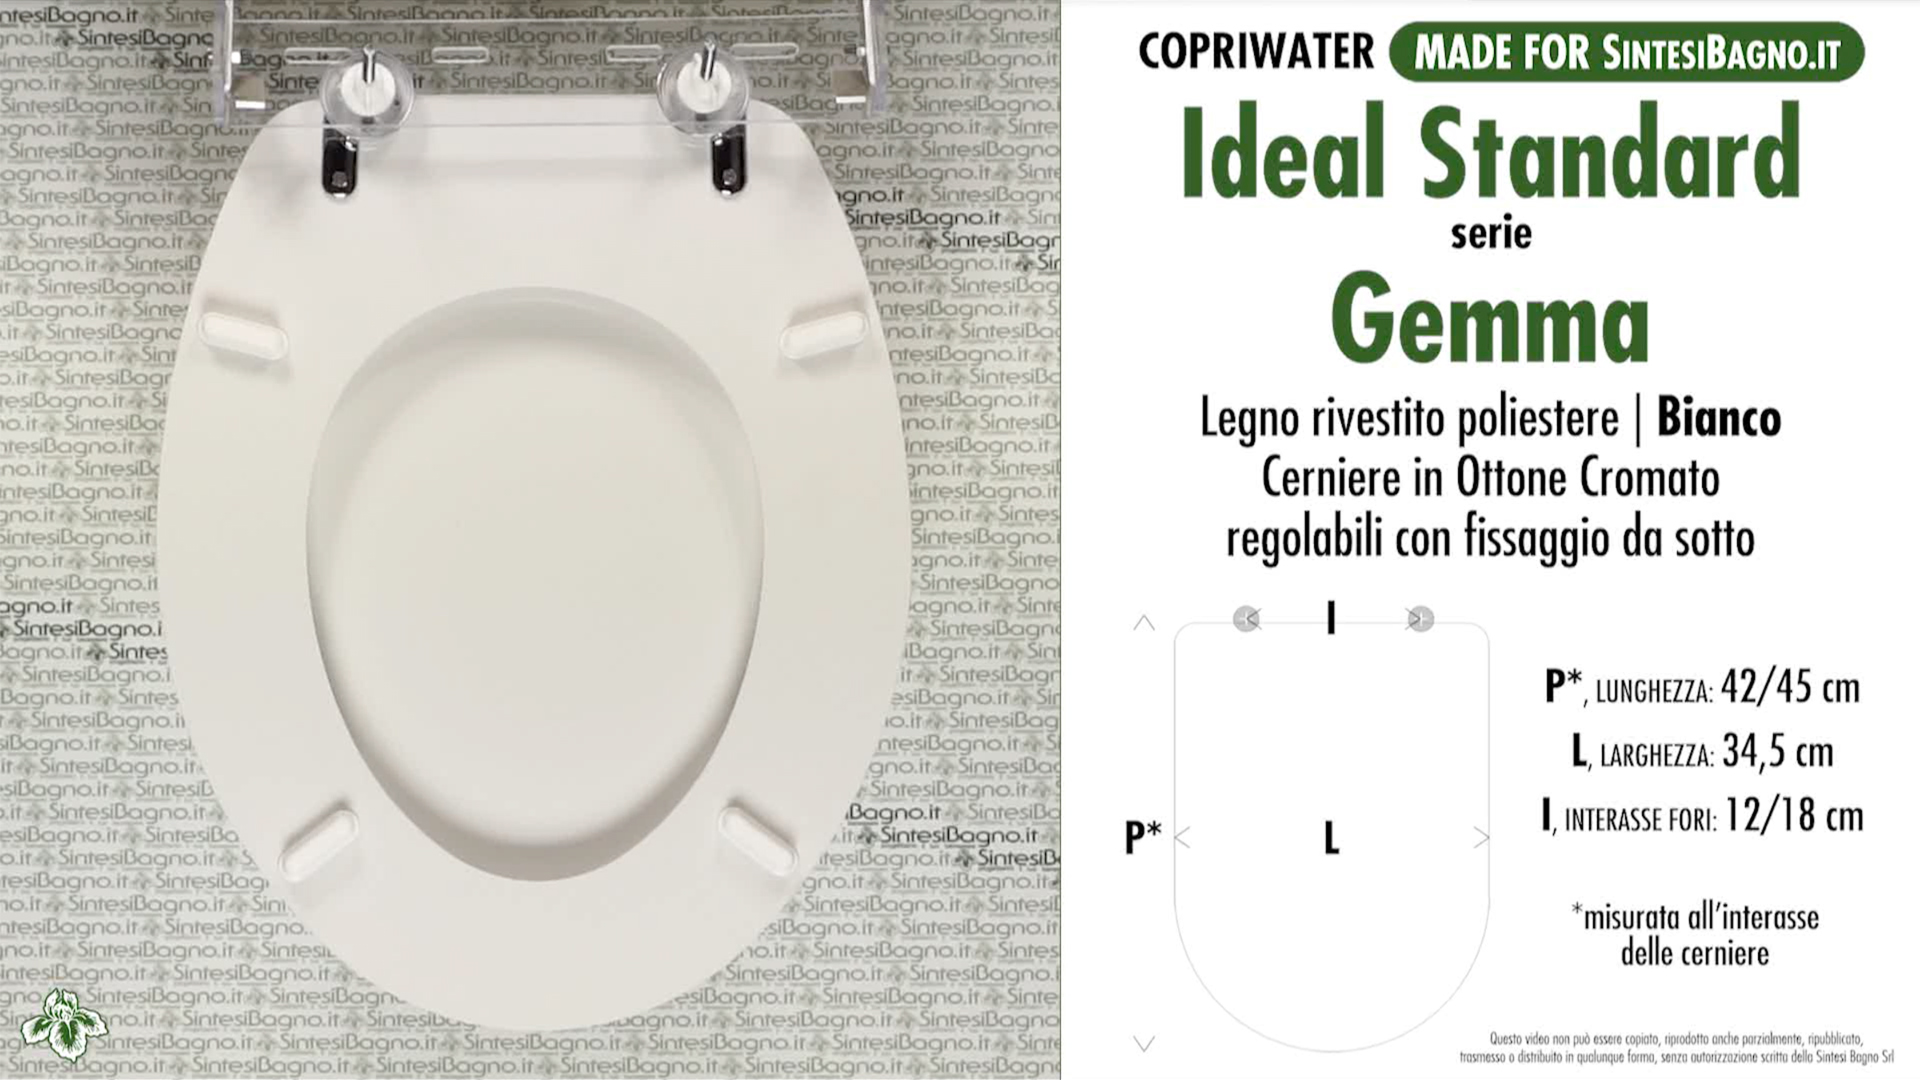 Schede tecniche misure copriwater ideal standard serie gemma for Calla ideal standard scheda tecnica